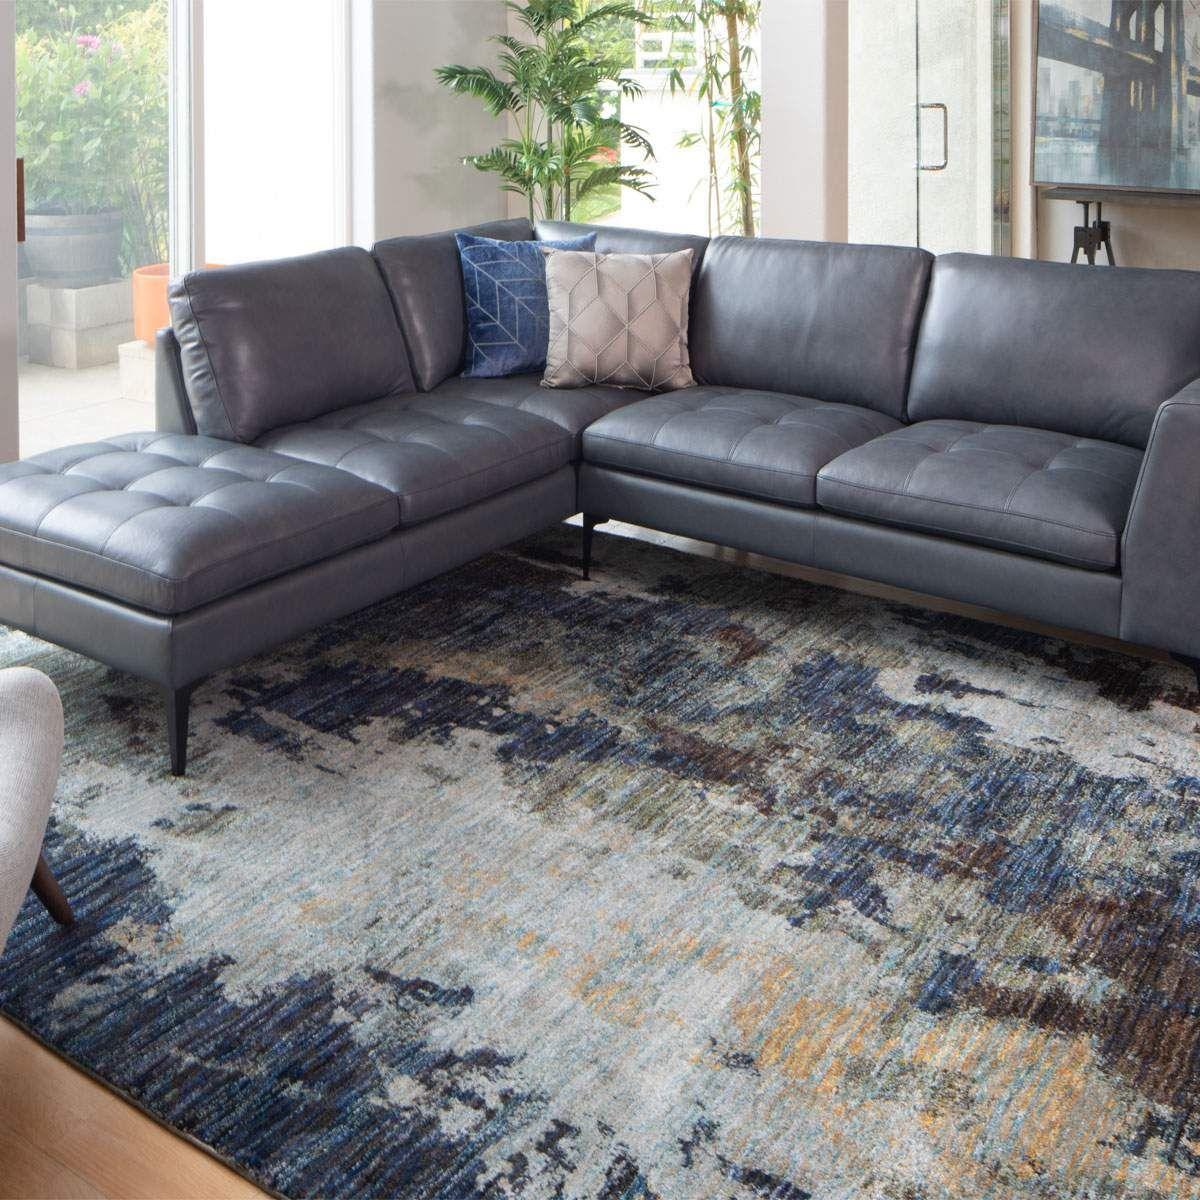 Slater In 2020 Contemporary Sectional Sofa Contemporary Sofa Modern Apartment Decor